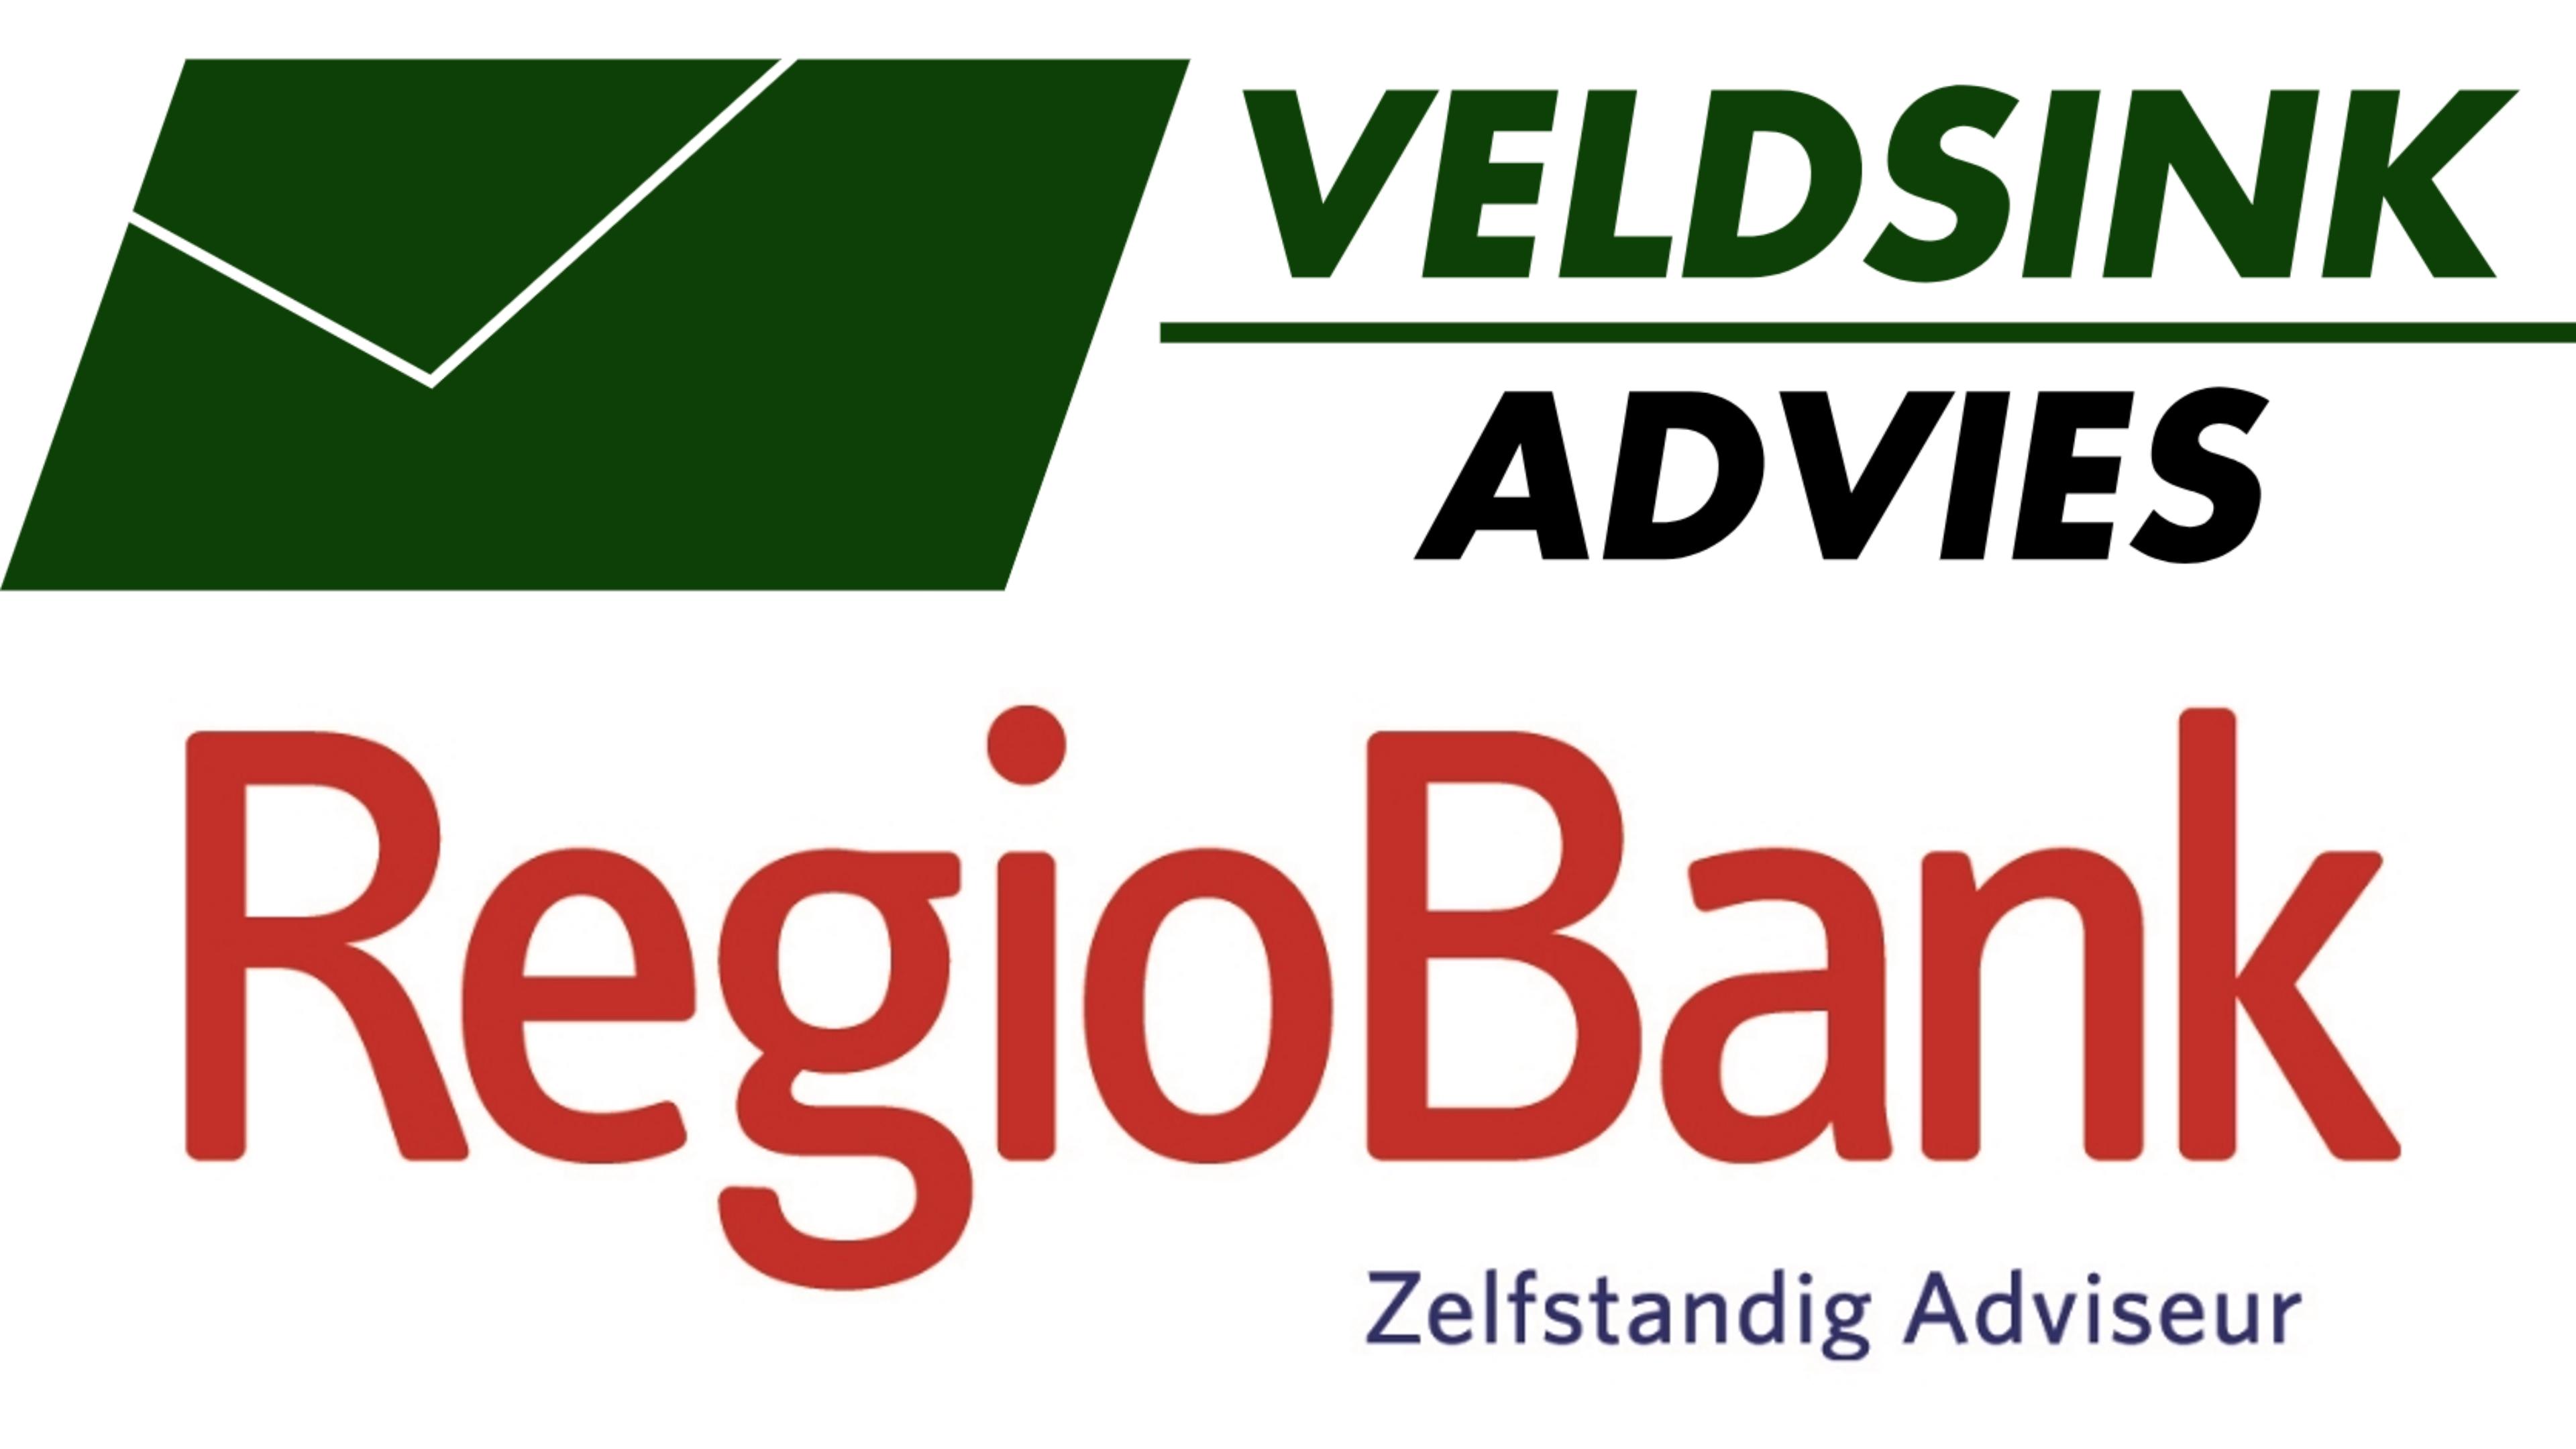 Veldsink adviesgroep / Regiobank